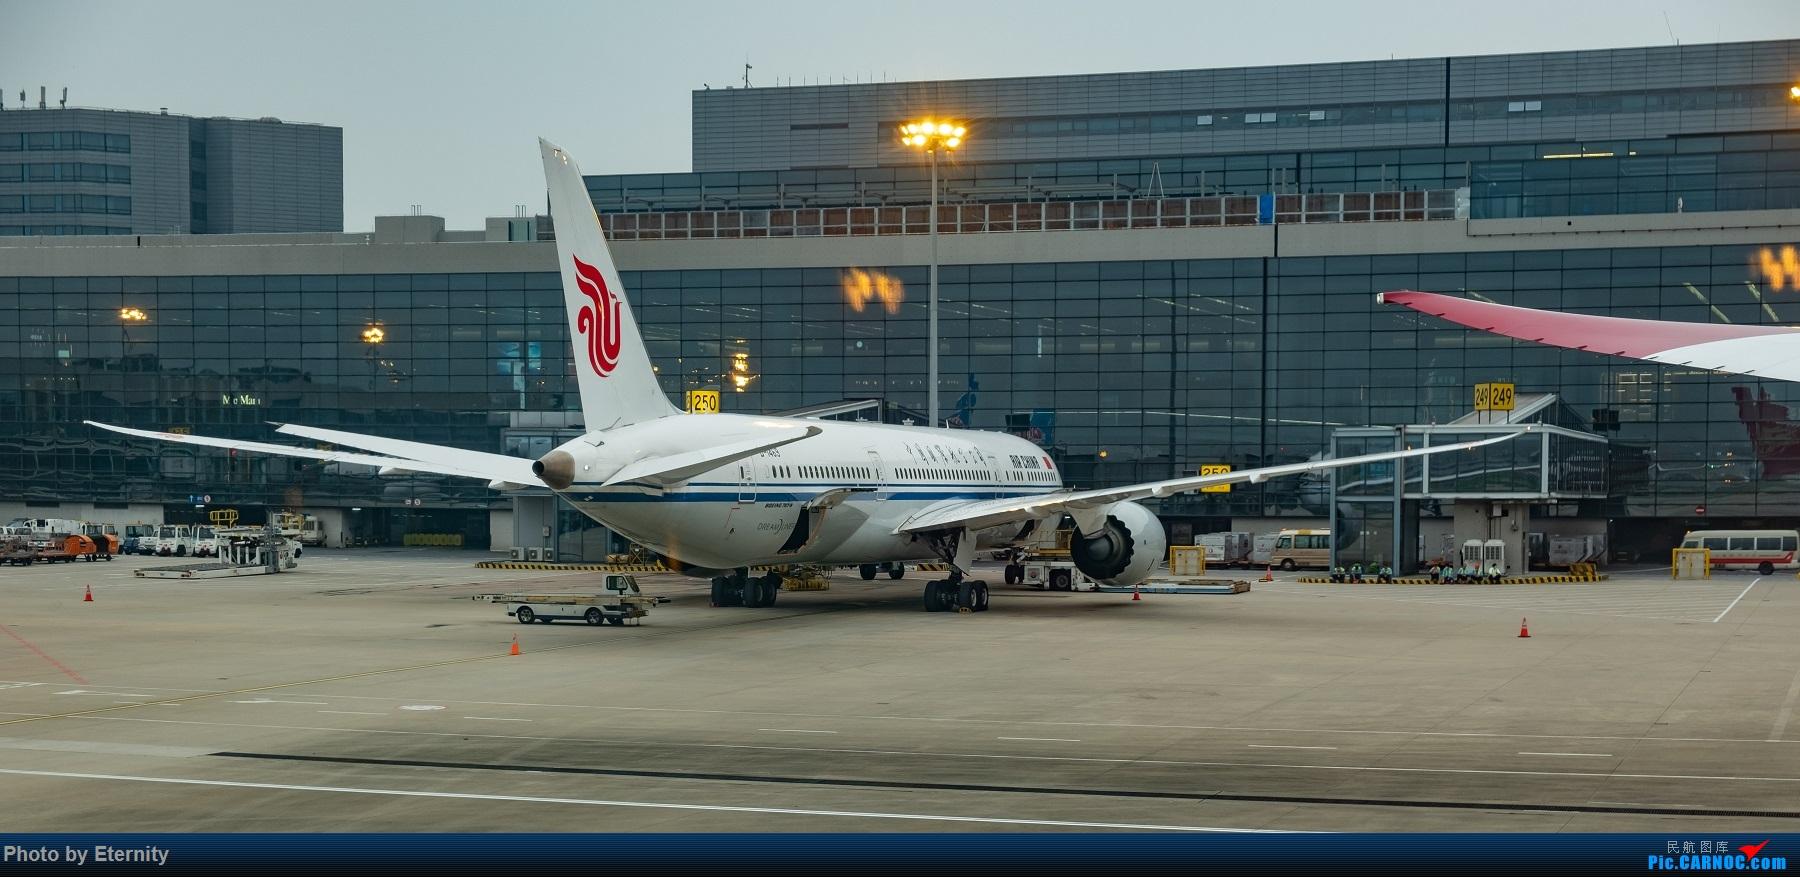 Re:[原创]后疫情期间的暑假国内游 | 西安-上海-广州-成都 | 体验国内3条干线 | 吉祥航空787 | 南航350 | 海航737 BOEING 787-9 B-1469 中国上海虹桥国际机场